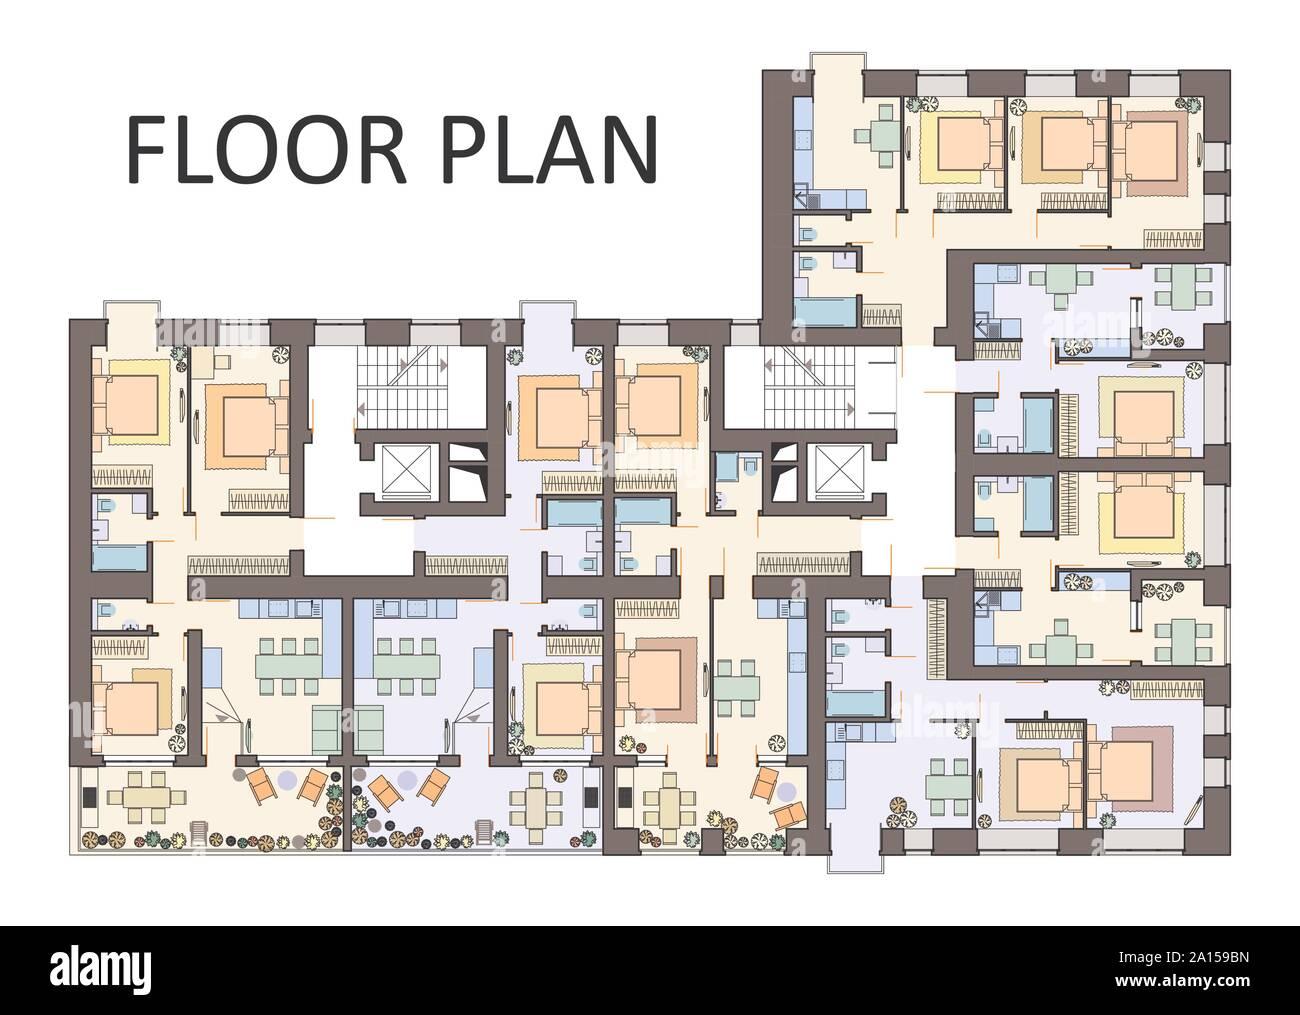 Detailed Architectural Floor Plan Apartment Layout Blueprint Vector Illustration Stock Vector Image Art Alamy